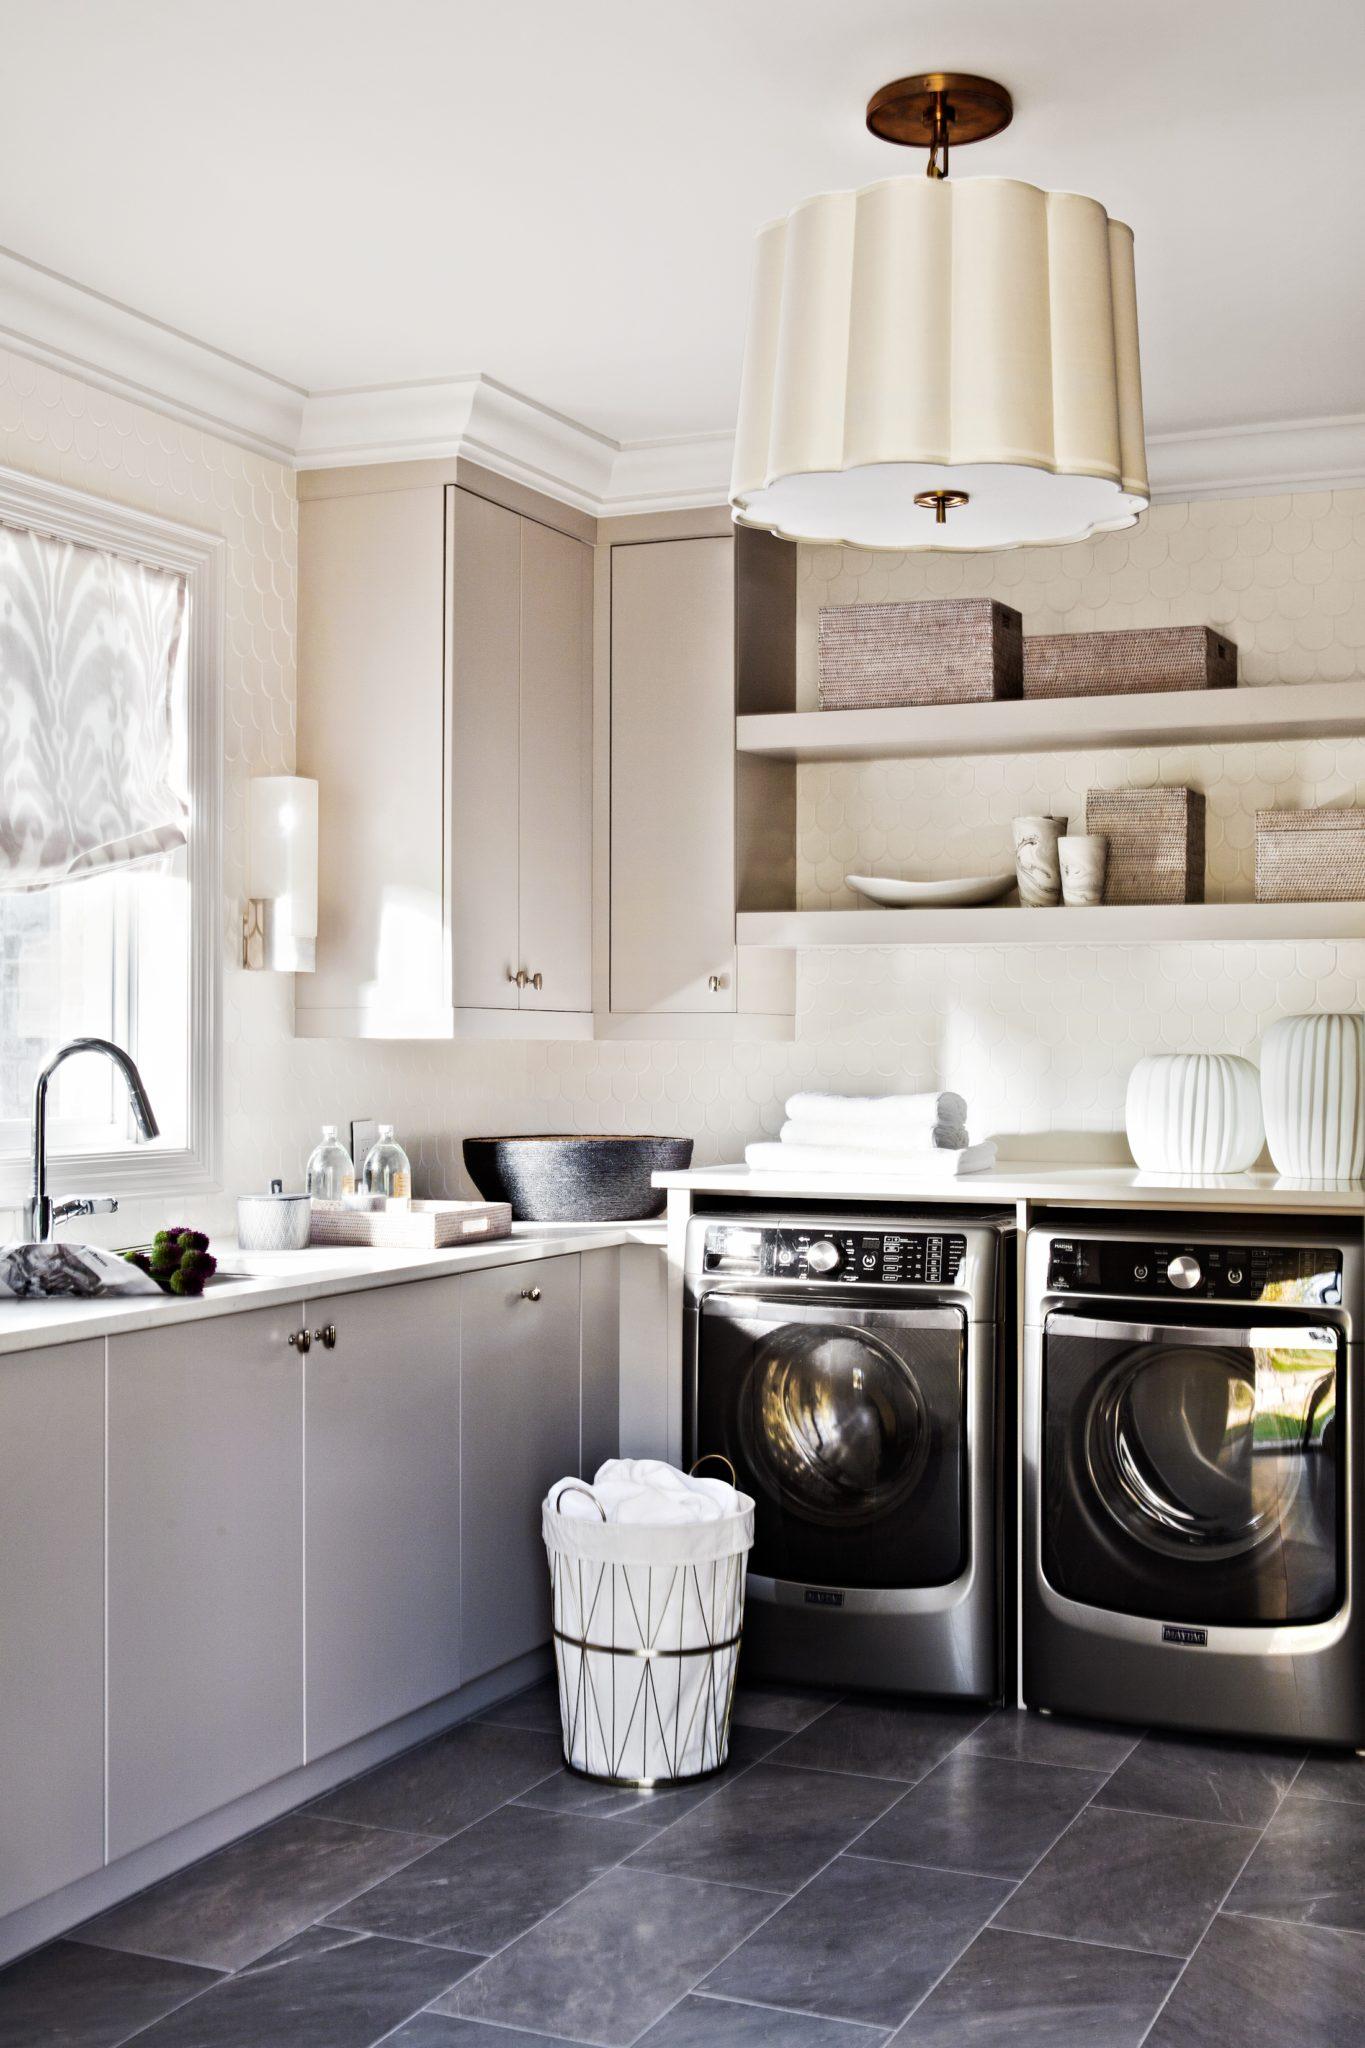 Laundry Room designed by Elizabeth Metcalfe Interiors & Design Inc. by Elizabeth Metcalfe Interiors & Design Inc.